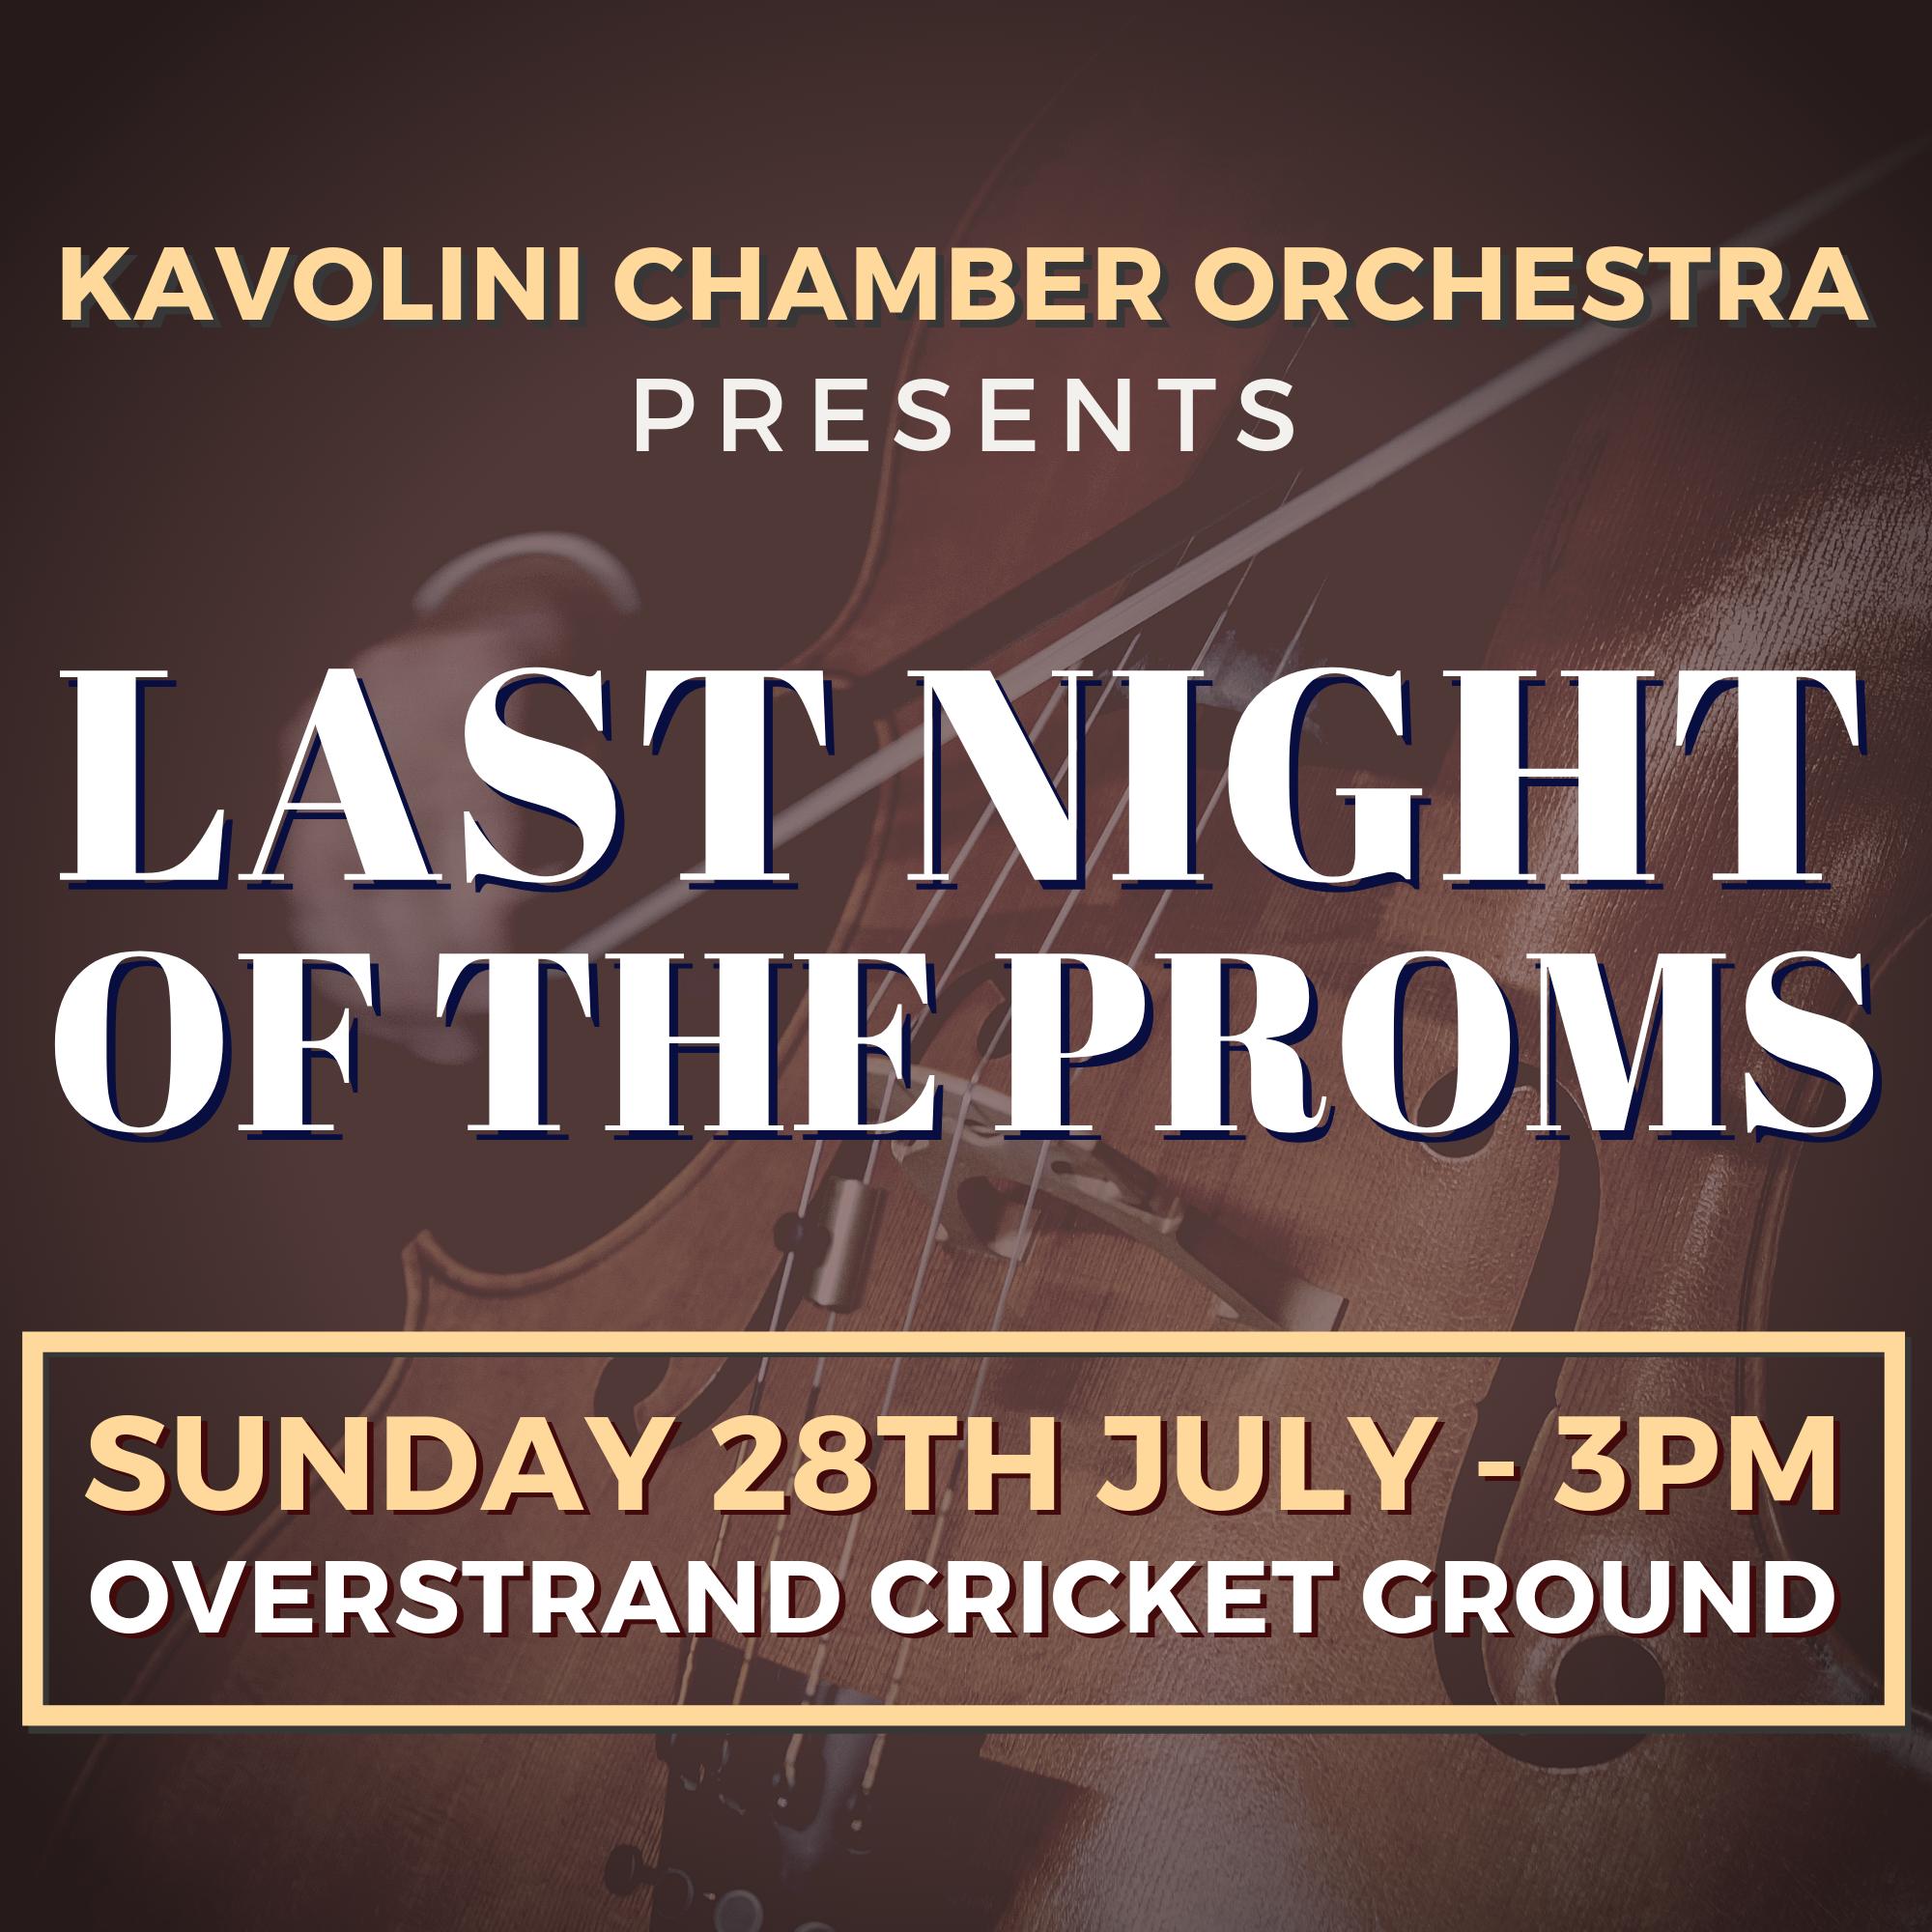 Last Night of Proms Overstrand